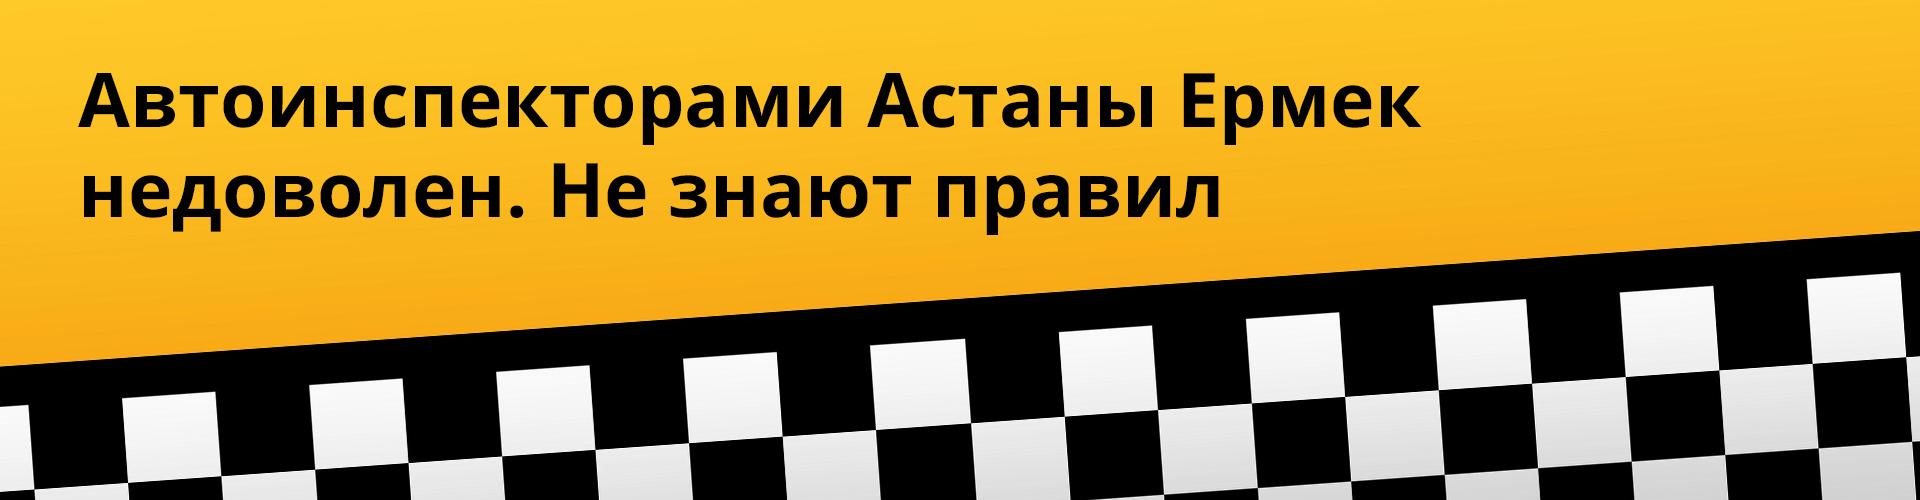 интервью с водителем яндекс такси